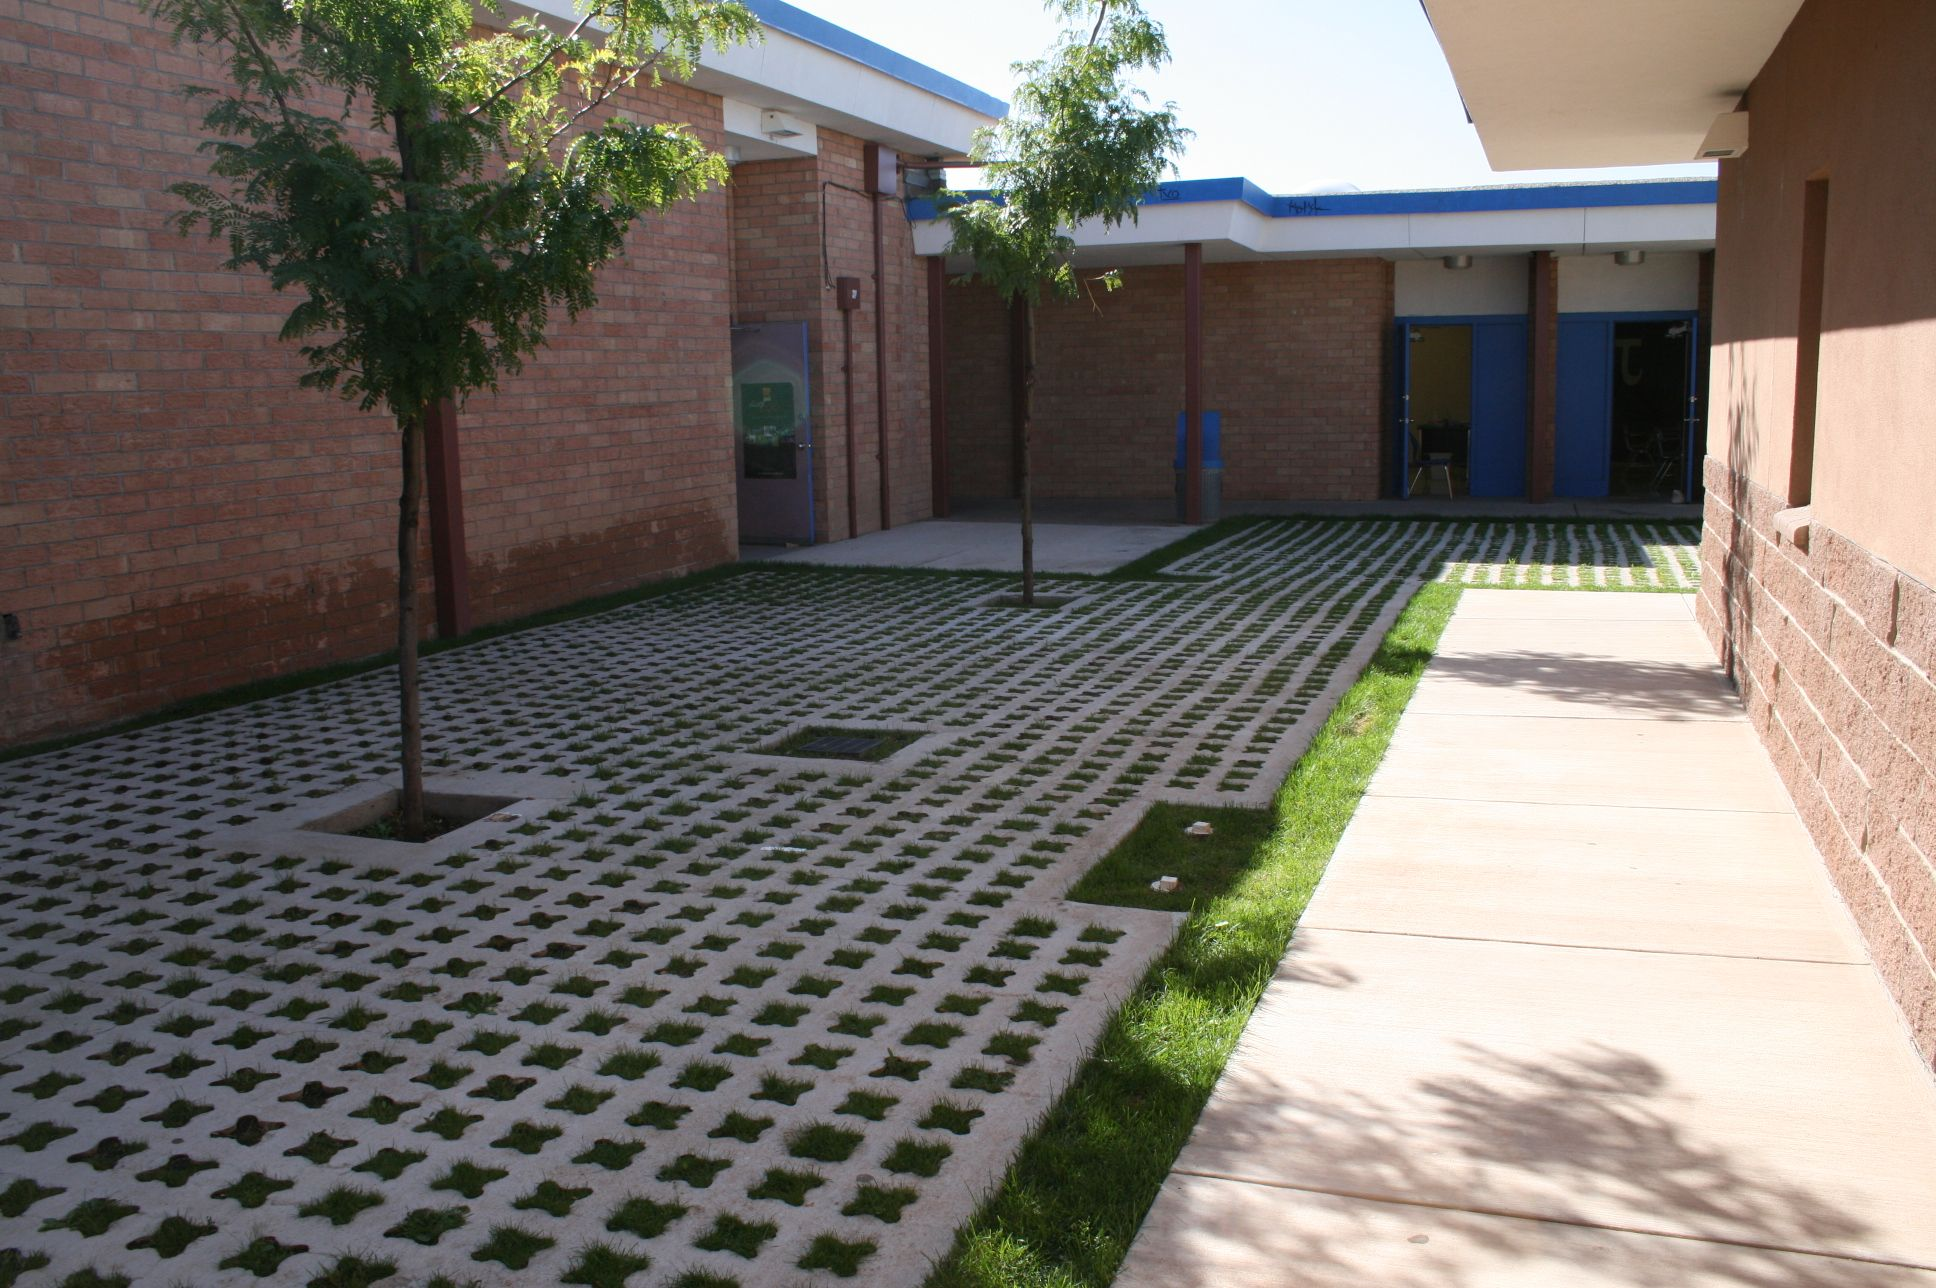 Grasscrete - St. Mikes School - 05